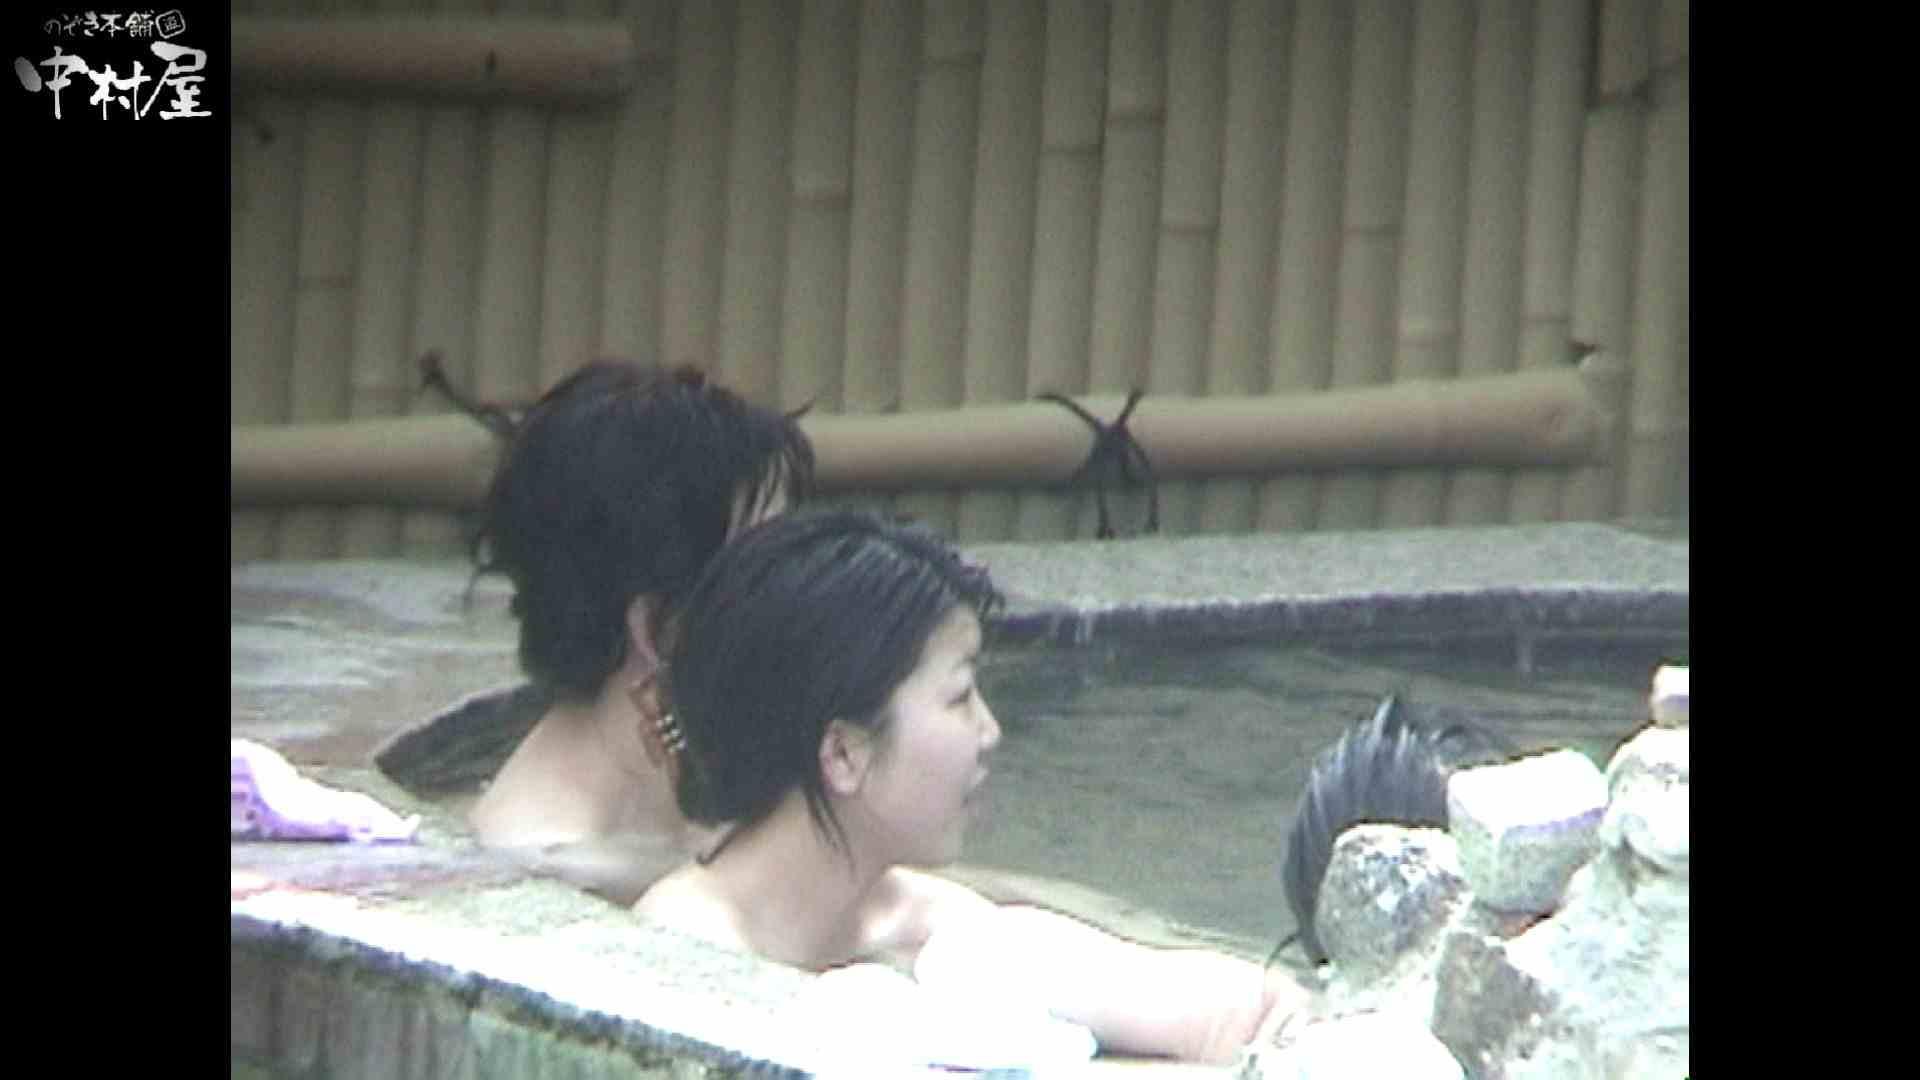 Aquaな露天風呂Vol.936 いやらしいOL オメコ動画キャプチャ 85連発 42